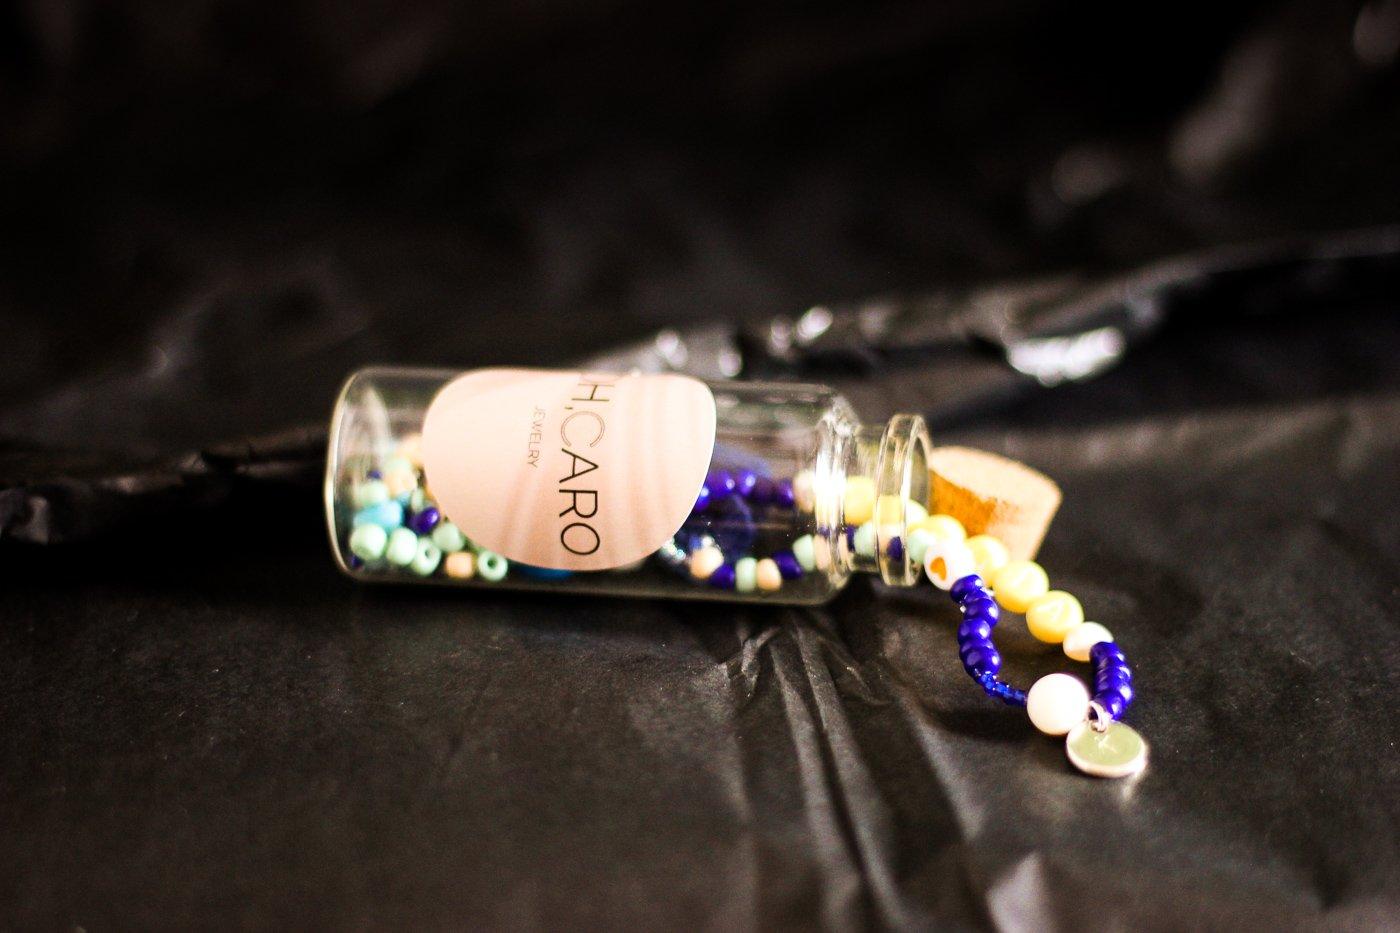 conny doll lifestyle: DIY-Kit Armband von OHCARO, Armband zum selbstmachen